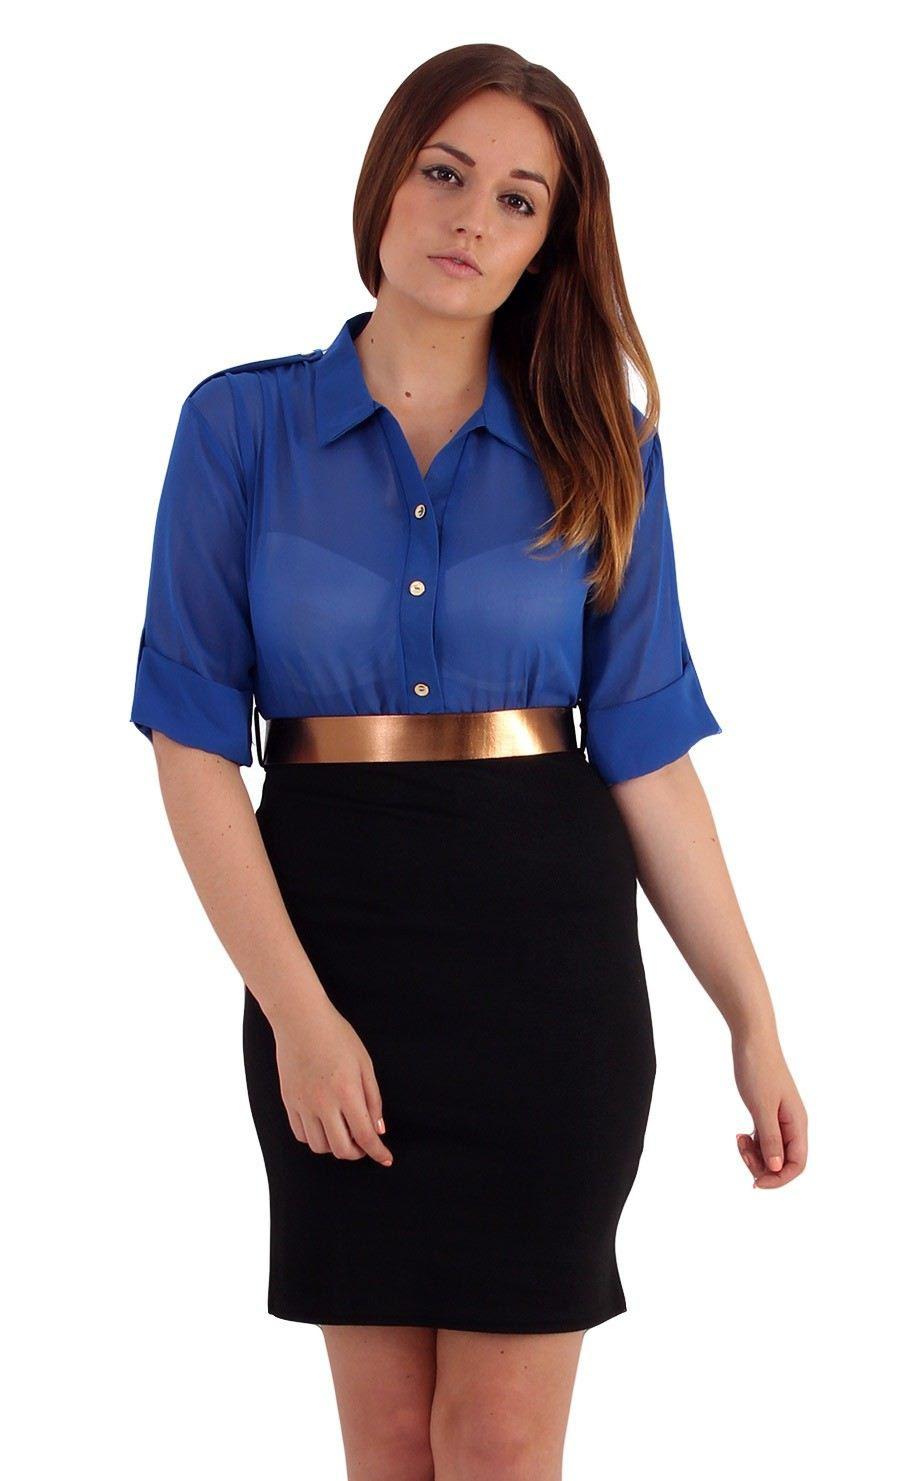 ladies 2 in 1 office wear turn up sleeve chiffon top mini